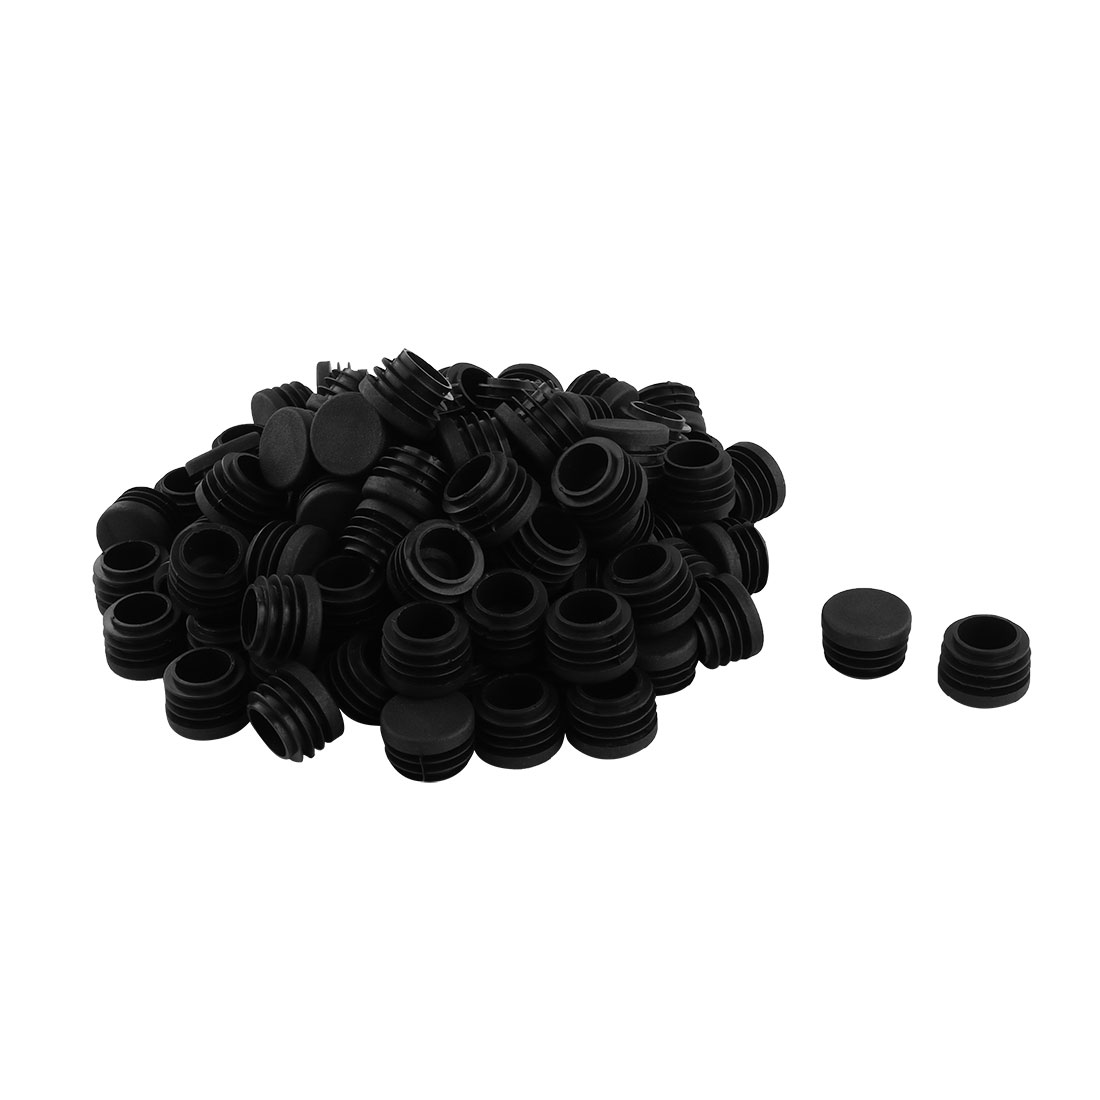 Desk Legs Plastic Round Design Tube Pipe Inserts End Blanking Caps Black 25mm Dia 100pcs